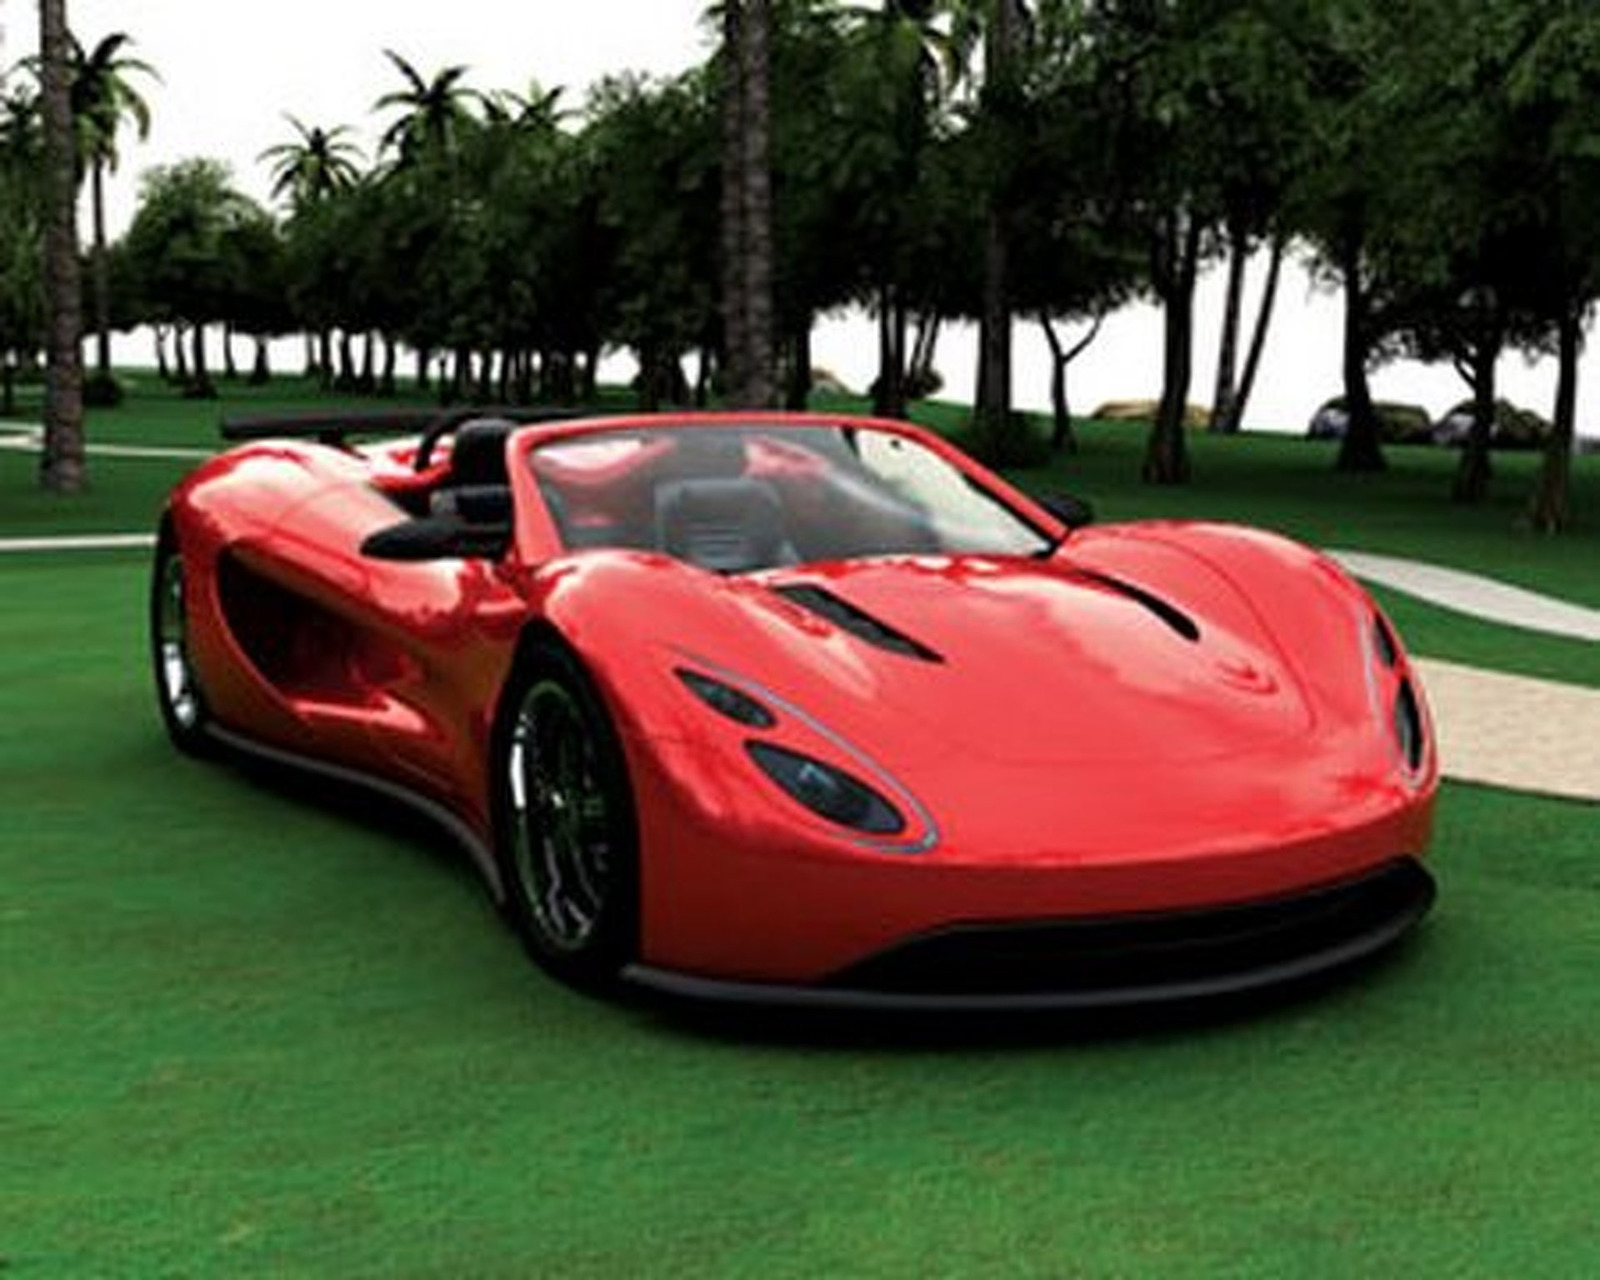 200 mph Hybrid - The Scorpion Supercar